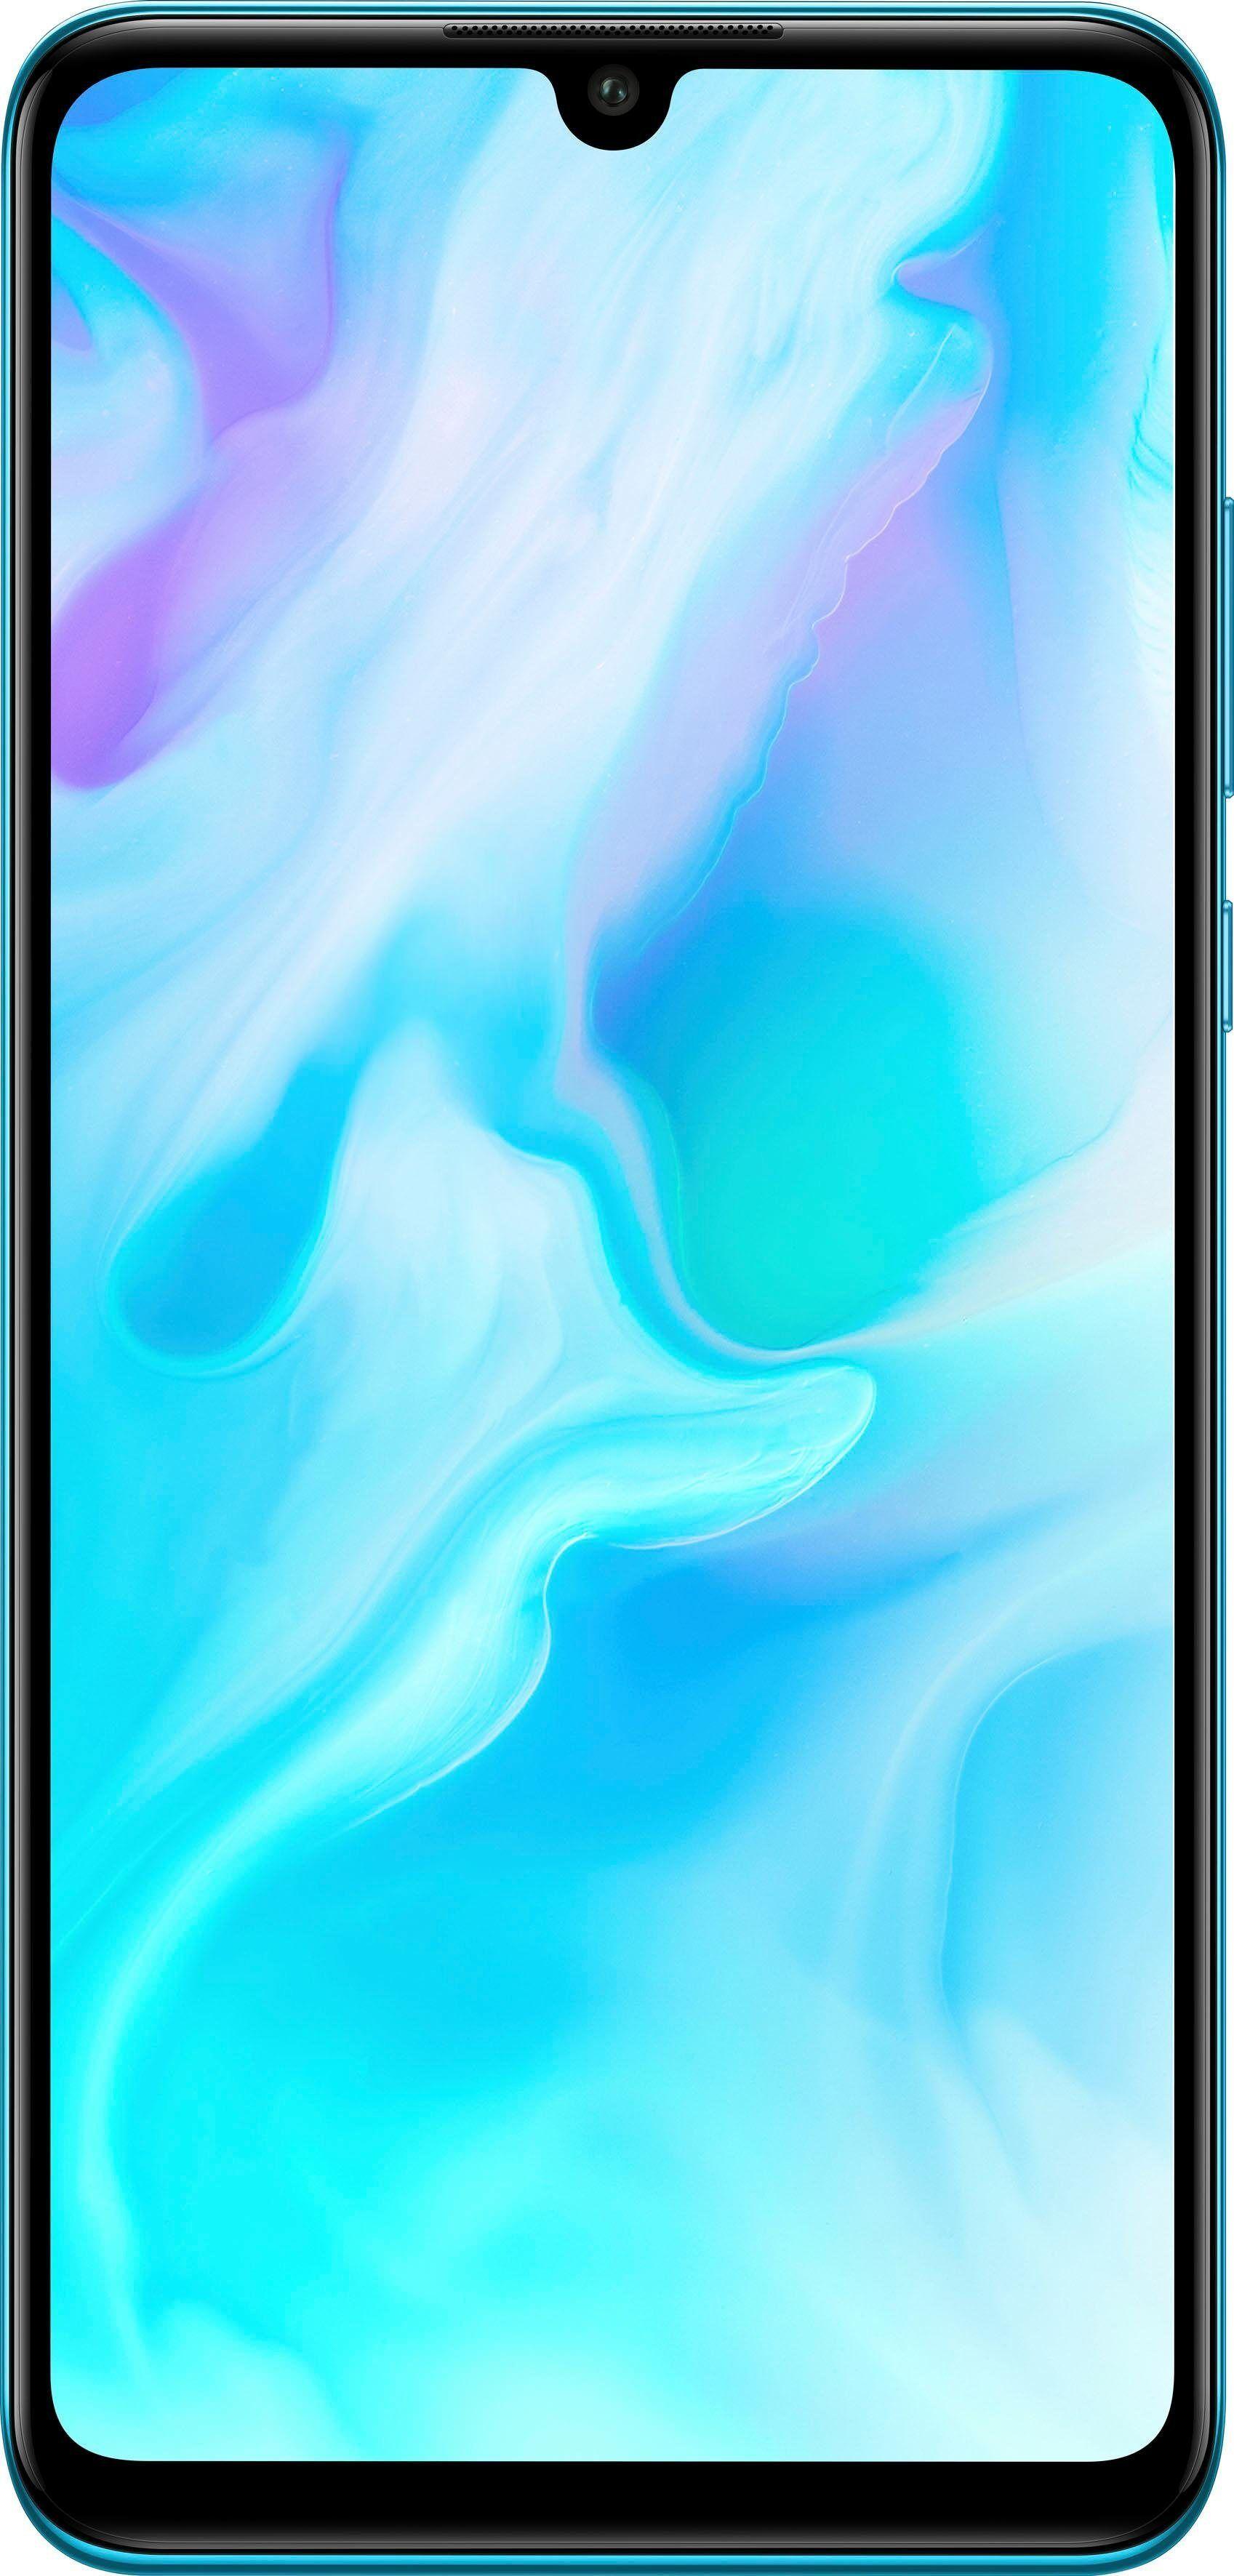 Huawei P30 lite Smartphone (15,62 cm/6,1 Zoll, 128 GB Speicherplatz, 48 MP Kamera), peacock blue